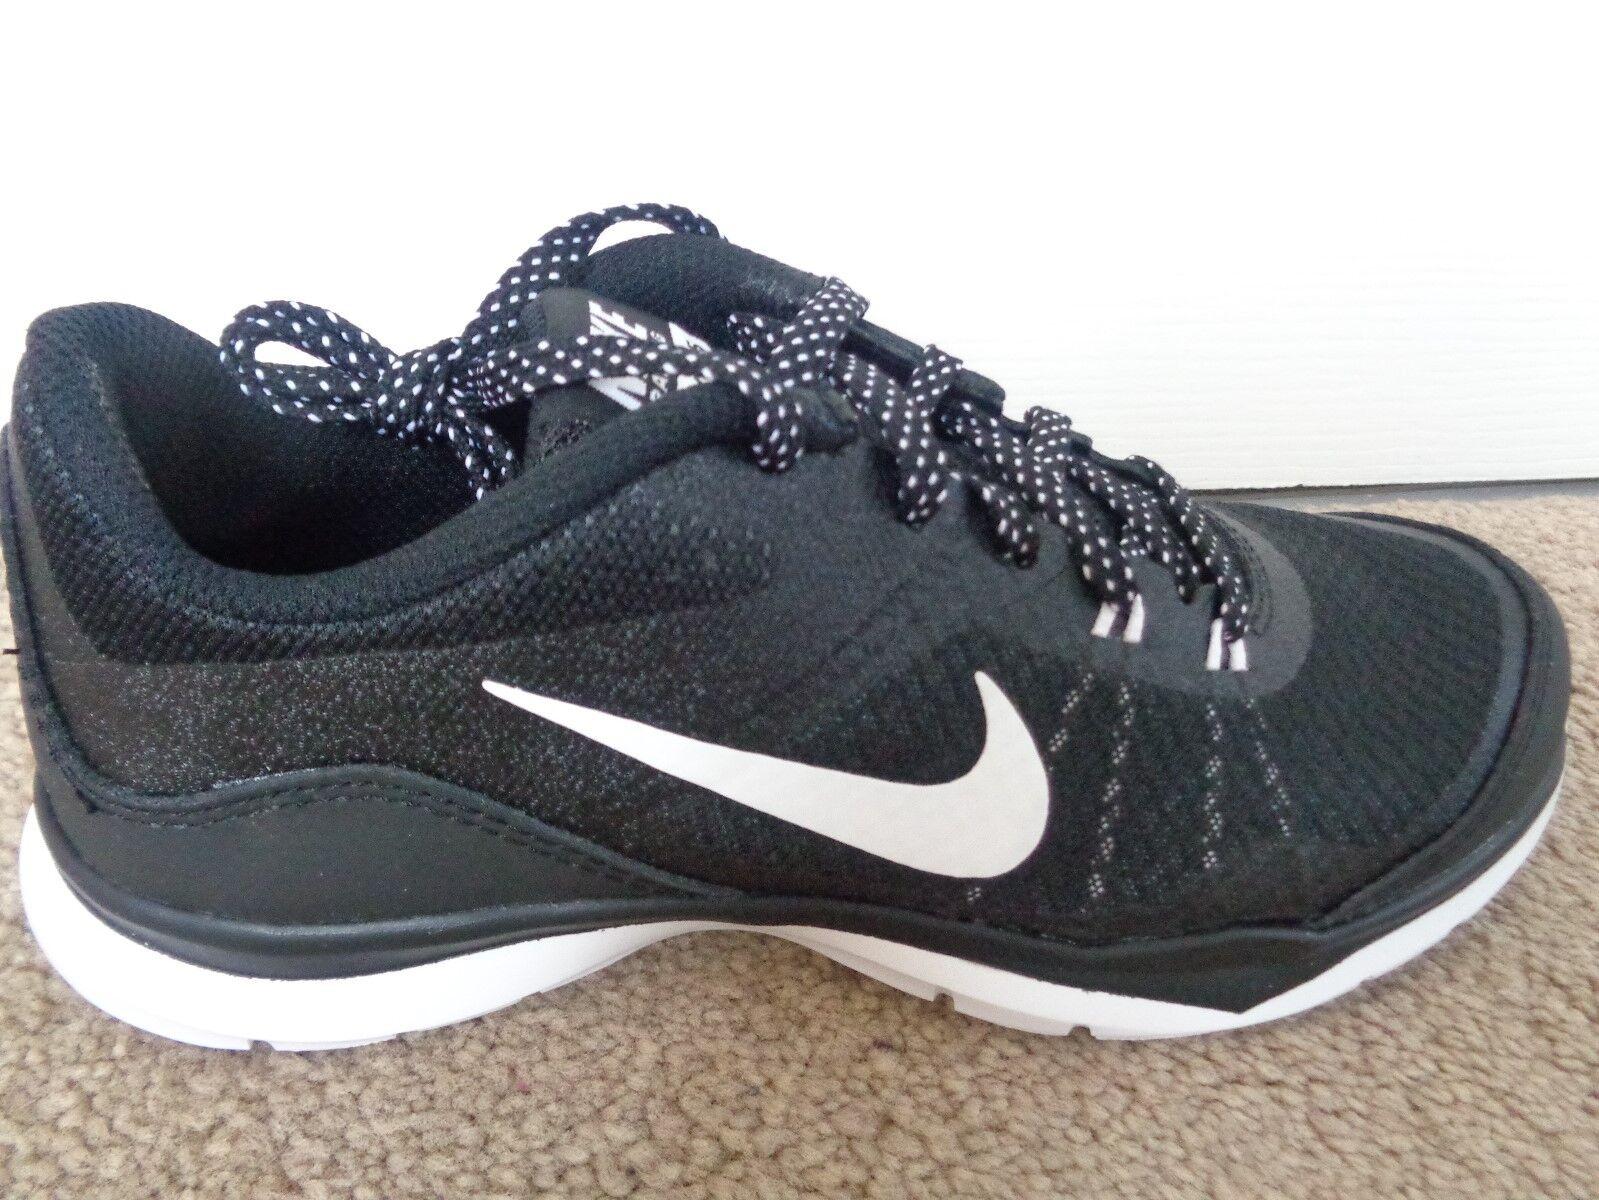 Nike Flex trainer 5 Donna trainers shoes 724858 001 uk 5.5 3 eu 36 us 5.5 uk NEW+BOX 2a1a7f